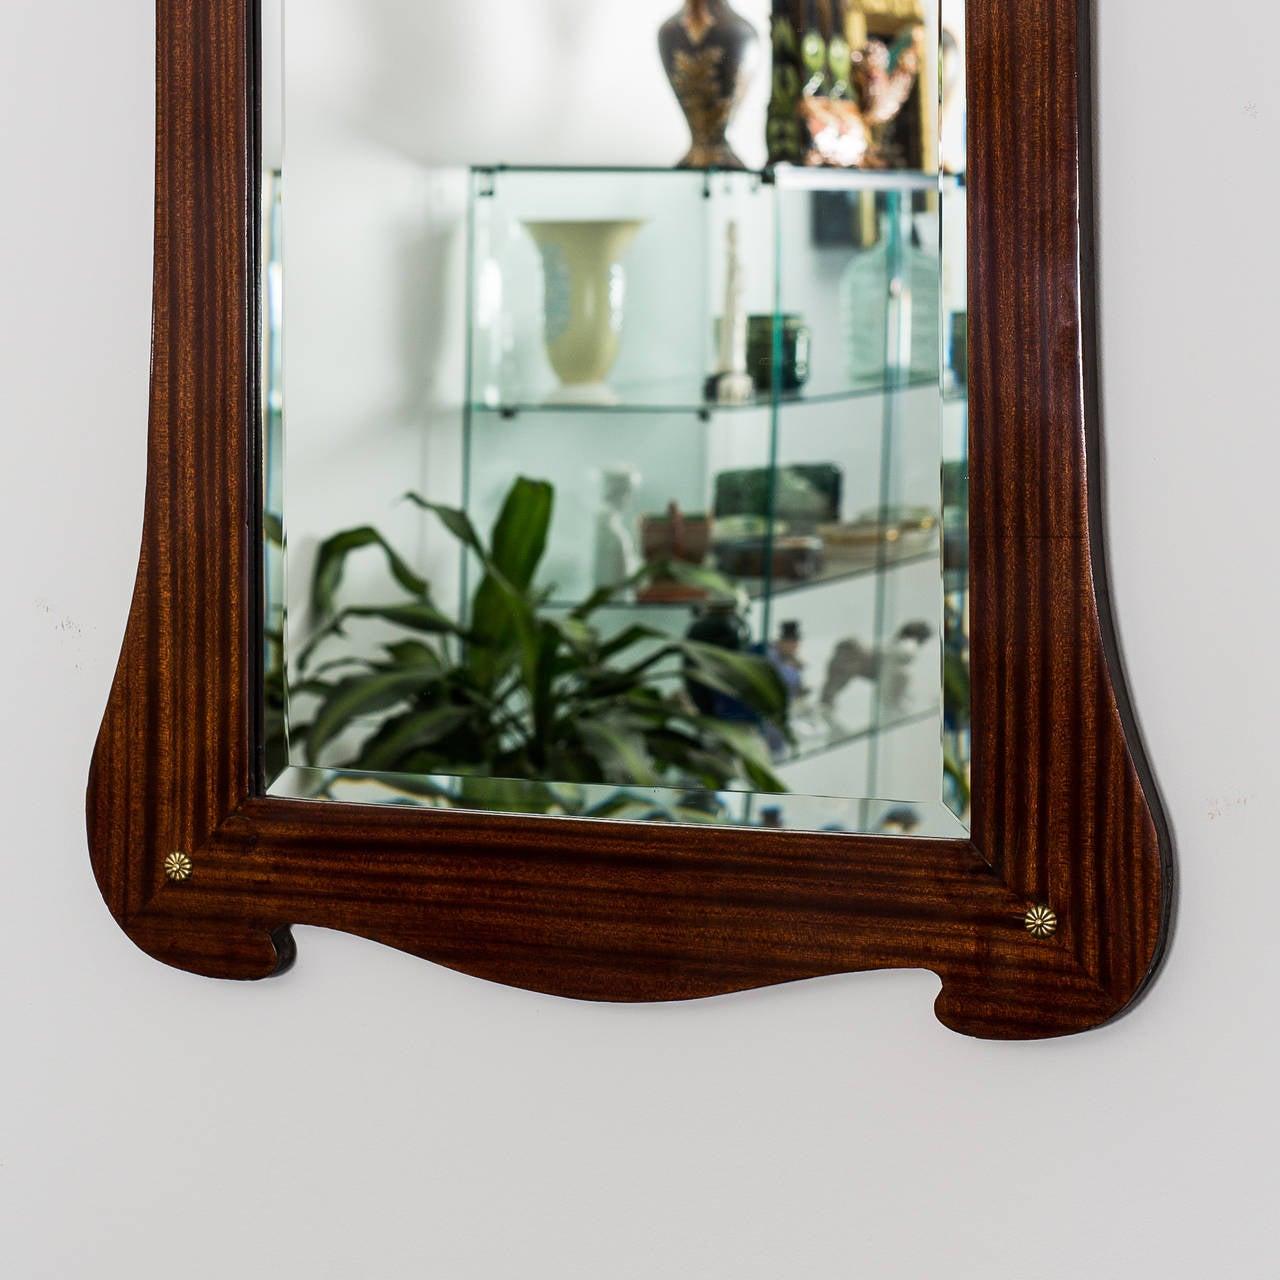 Appliqué Art Nouveau Mirror Mahogany, Austria, circa 1900 For Sale